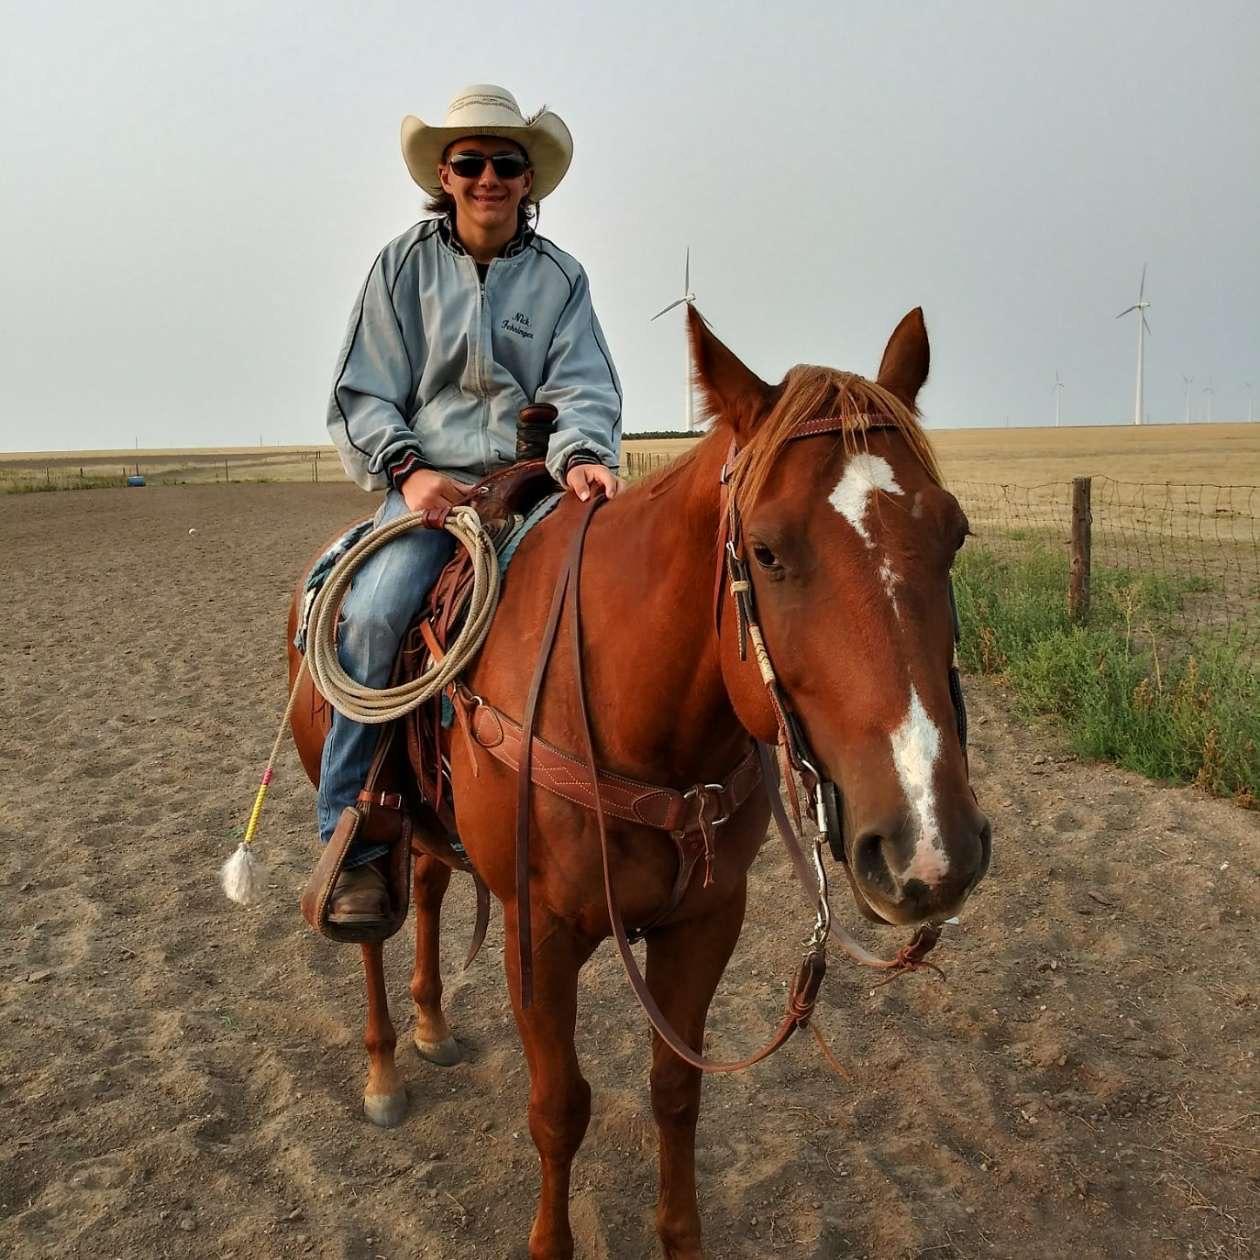 joe on his horse